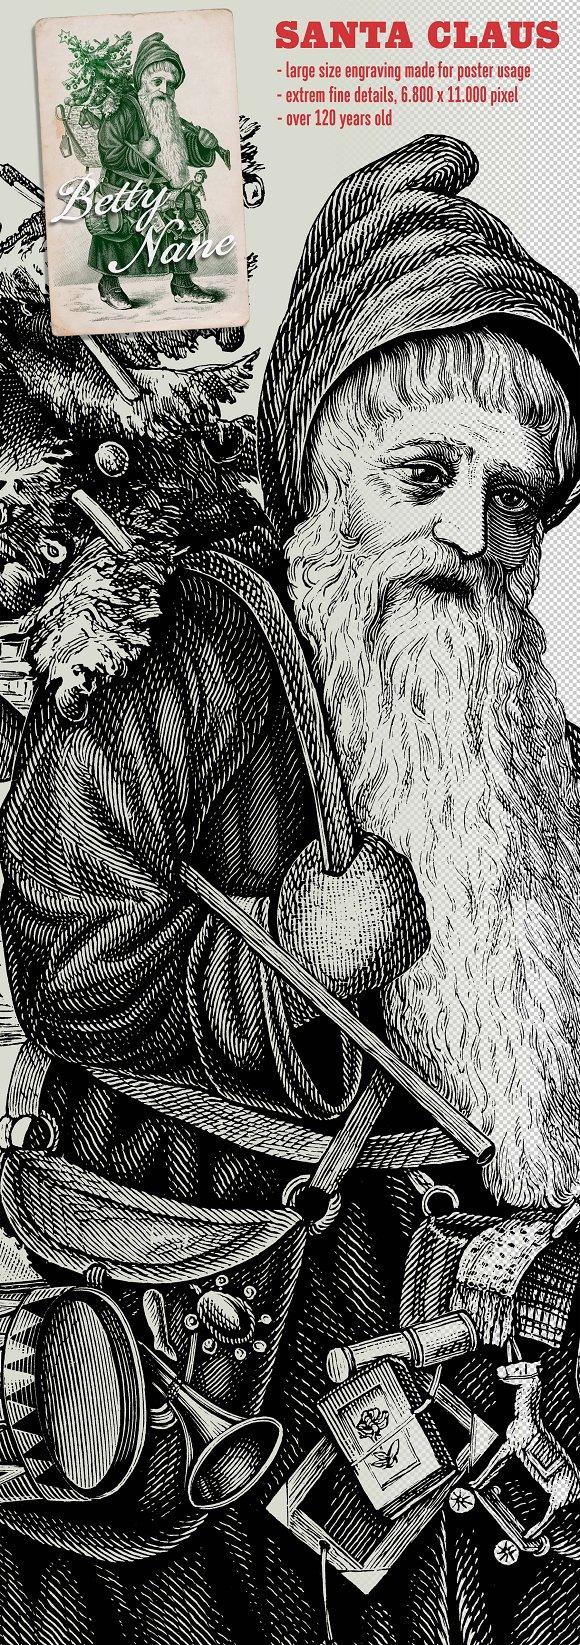 Antique Santa Claus Poster Engraving